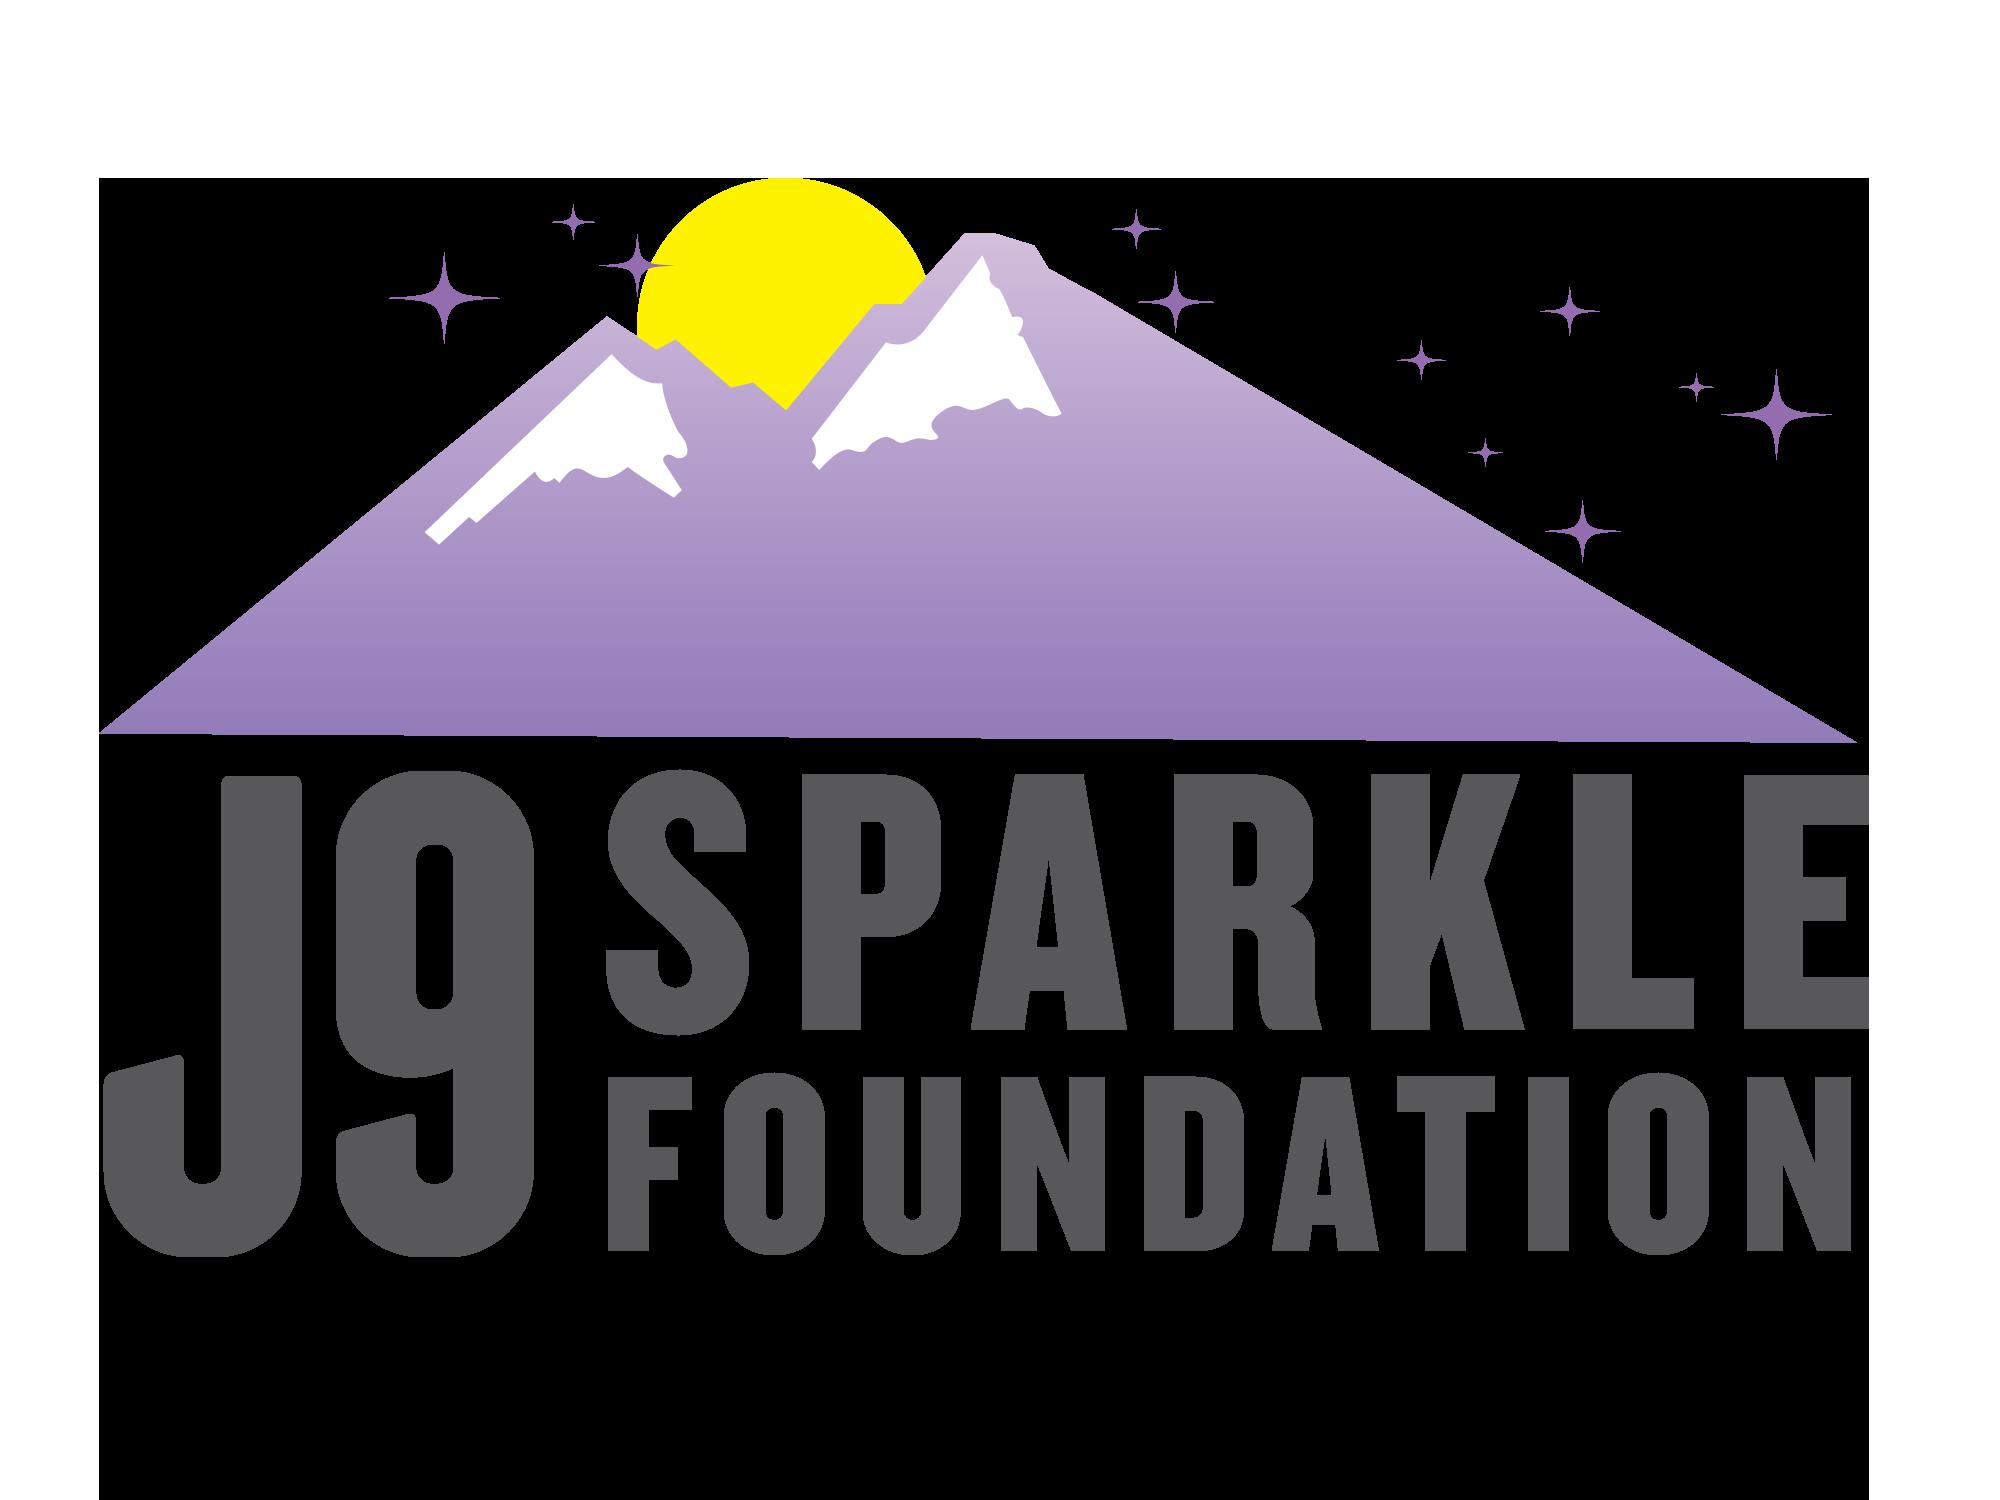 J9 SPARKLE FOUNDATION LOGO -